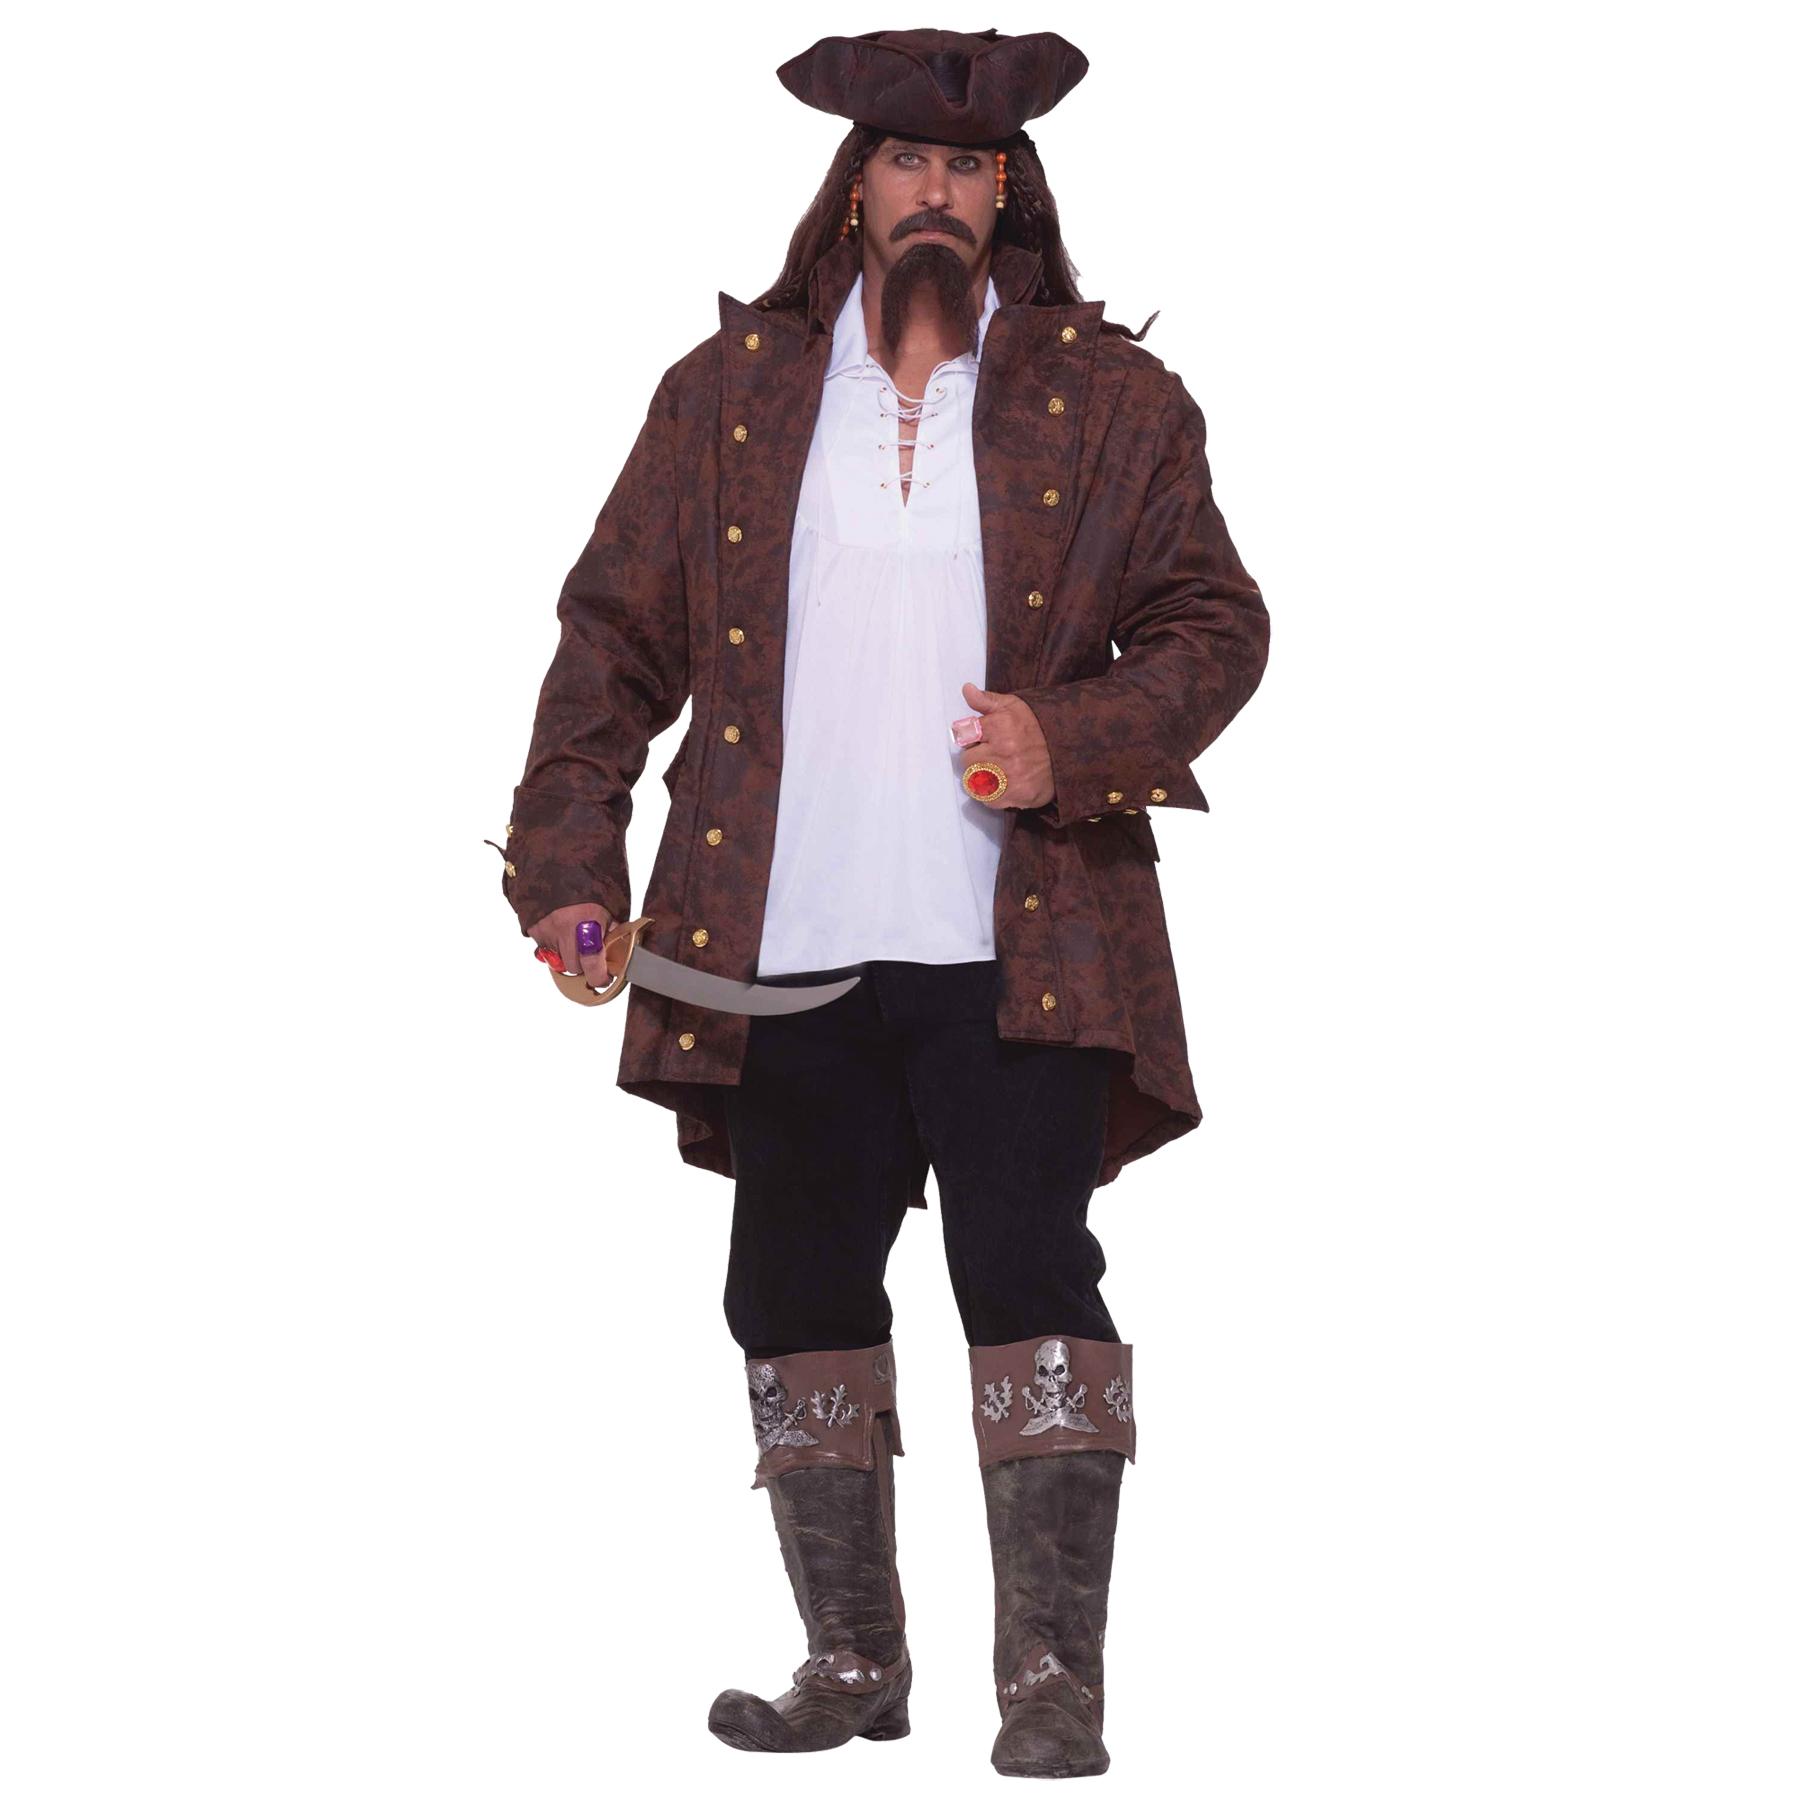 Men's Pirate Captain Costume PartNumber: 05022642000P KsnValue: 8735059 MfgPartNumber: FM64097